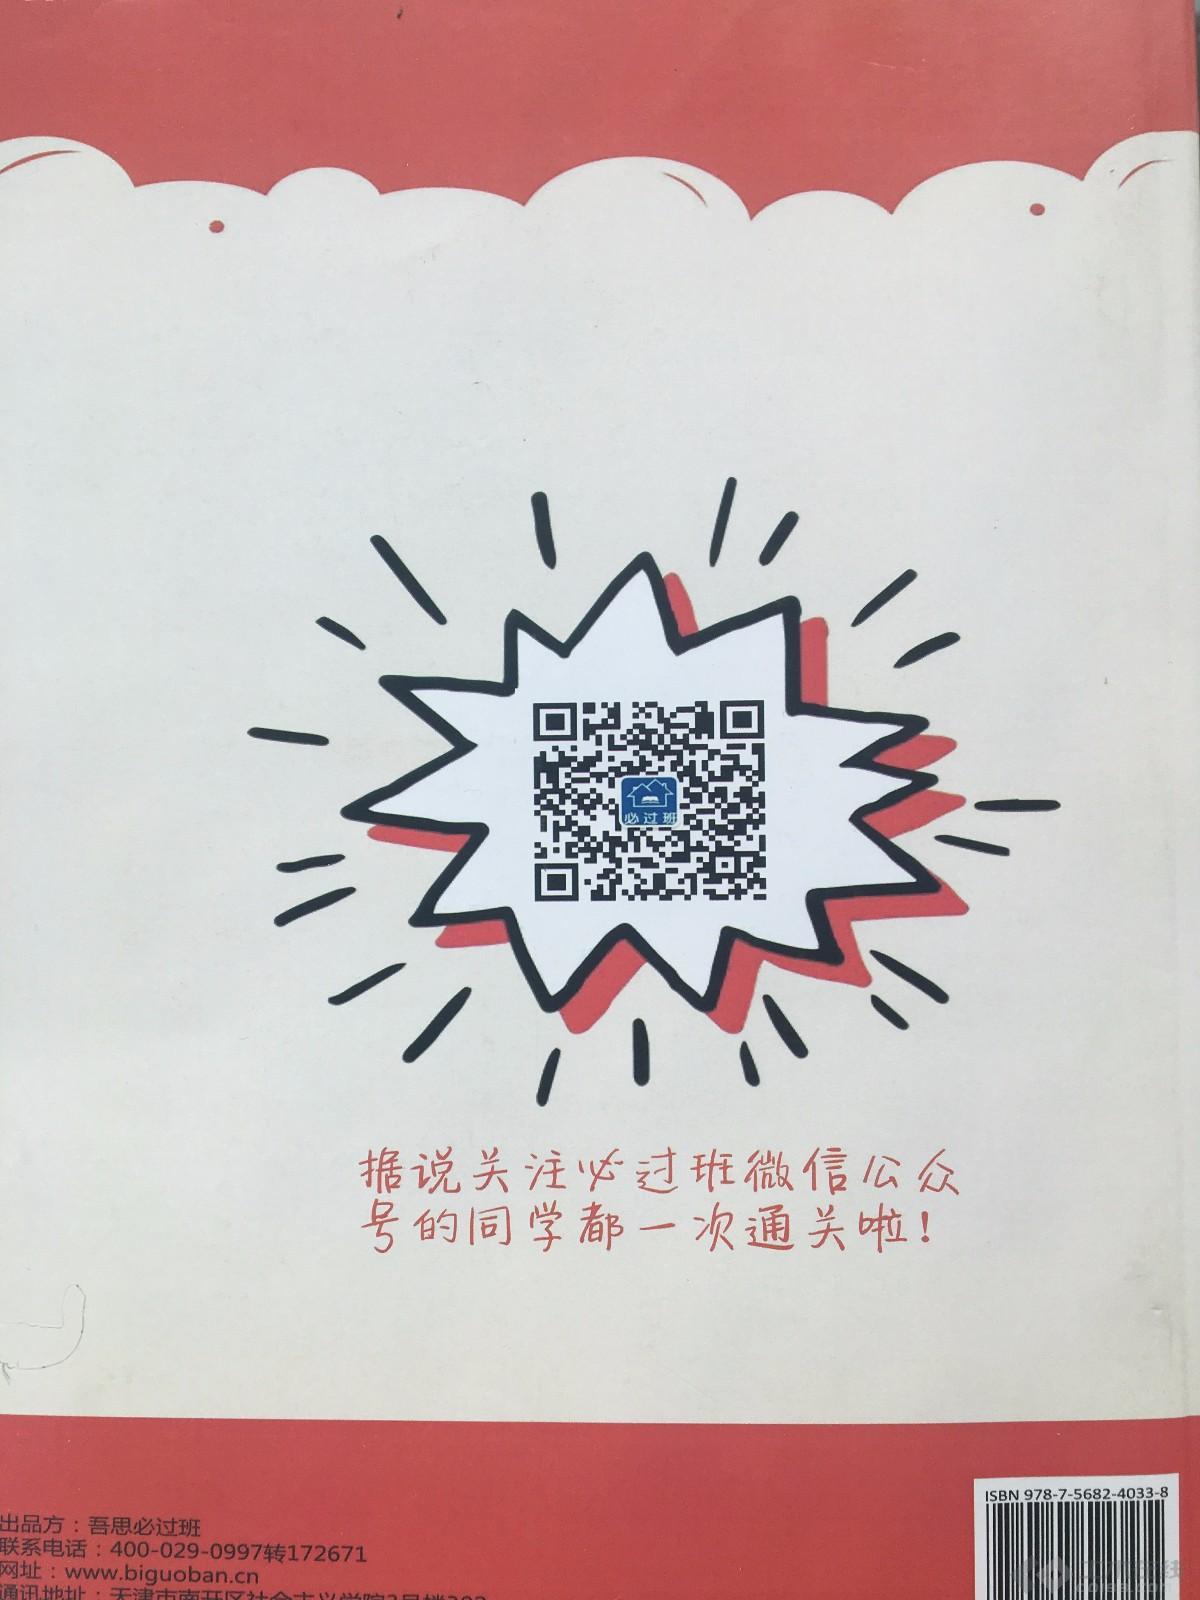 IMG_0340 - 副本.JPG